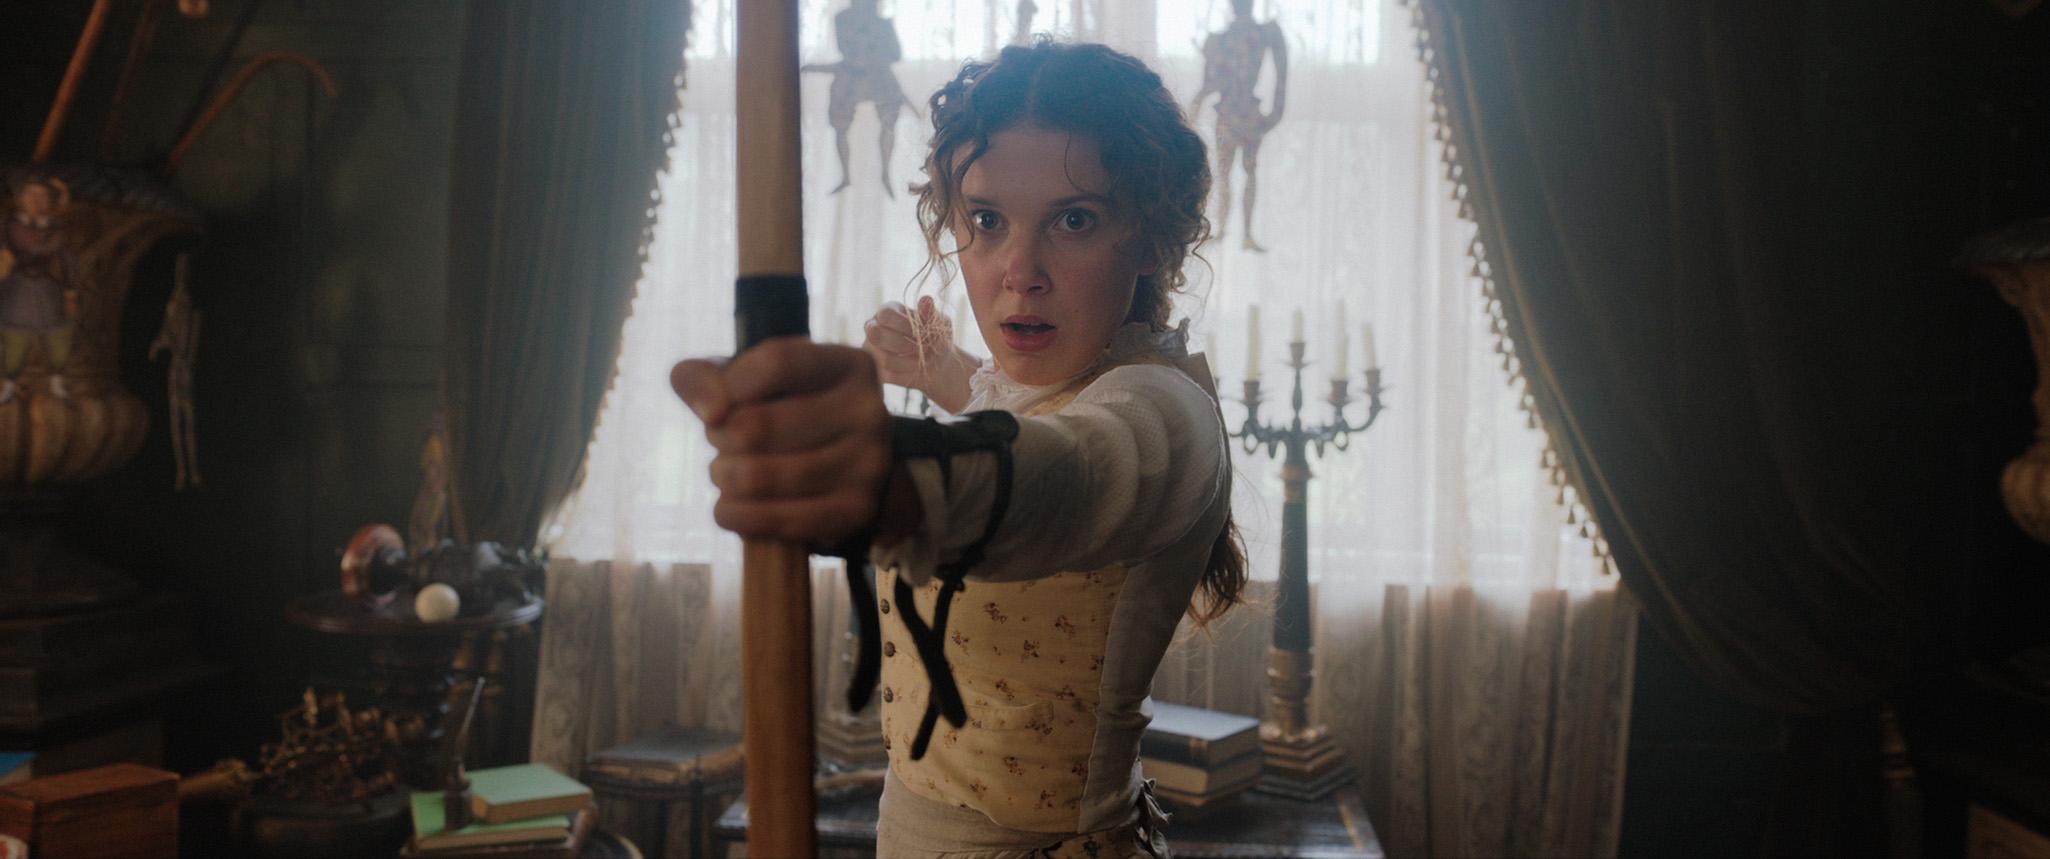 Millie Bobby Brown se convierte en la hermana de Sherlock Holmes para el próximo filme de Netflix